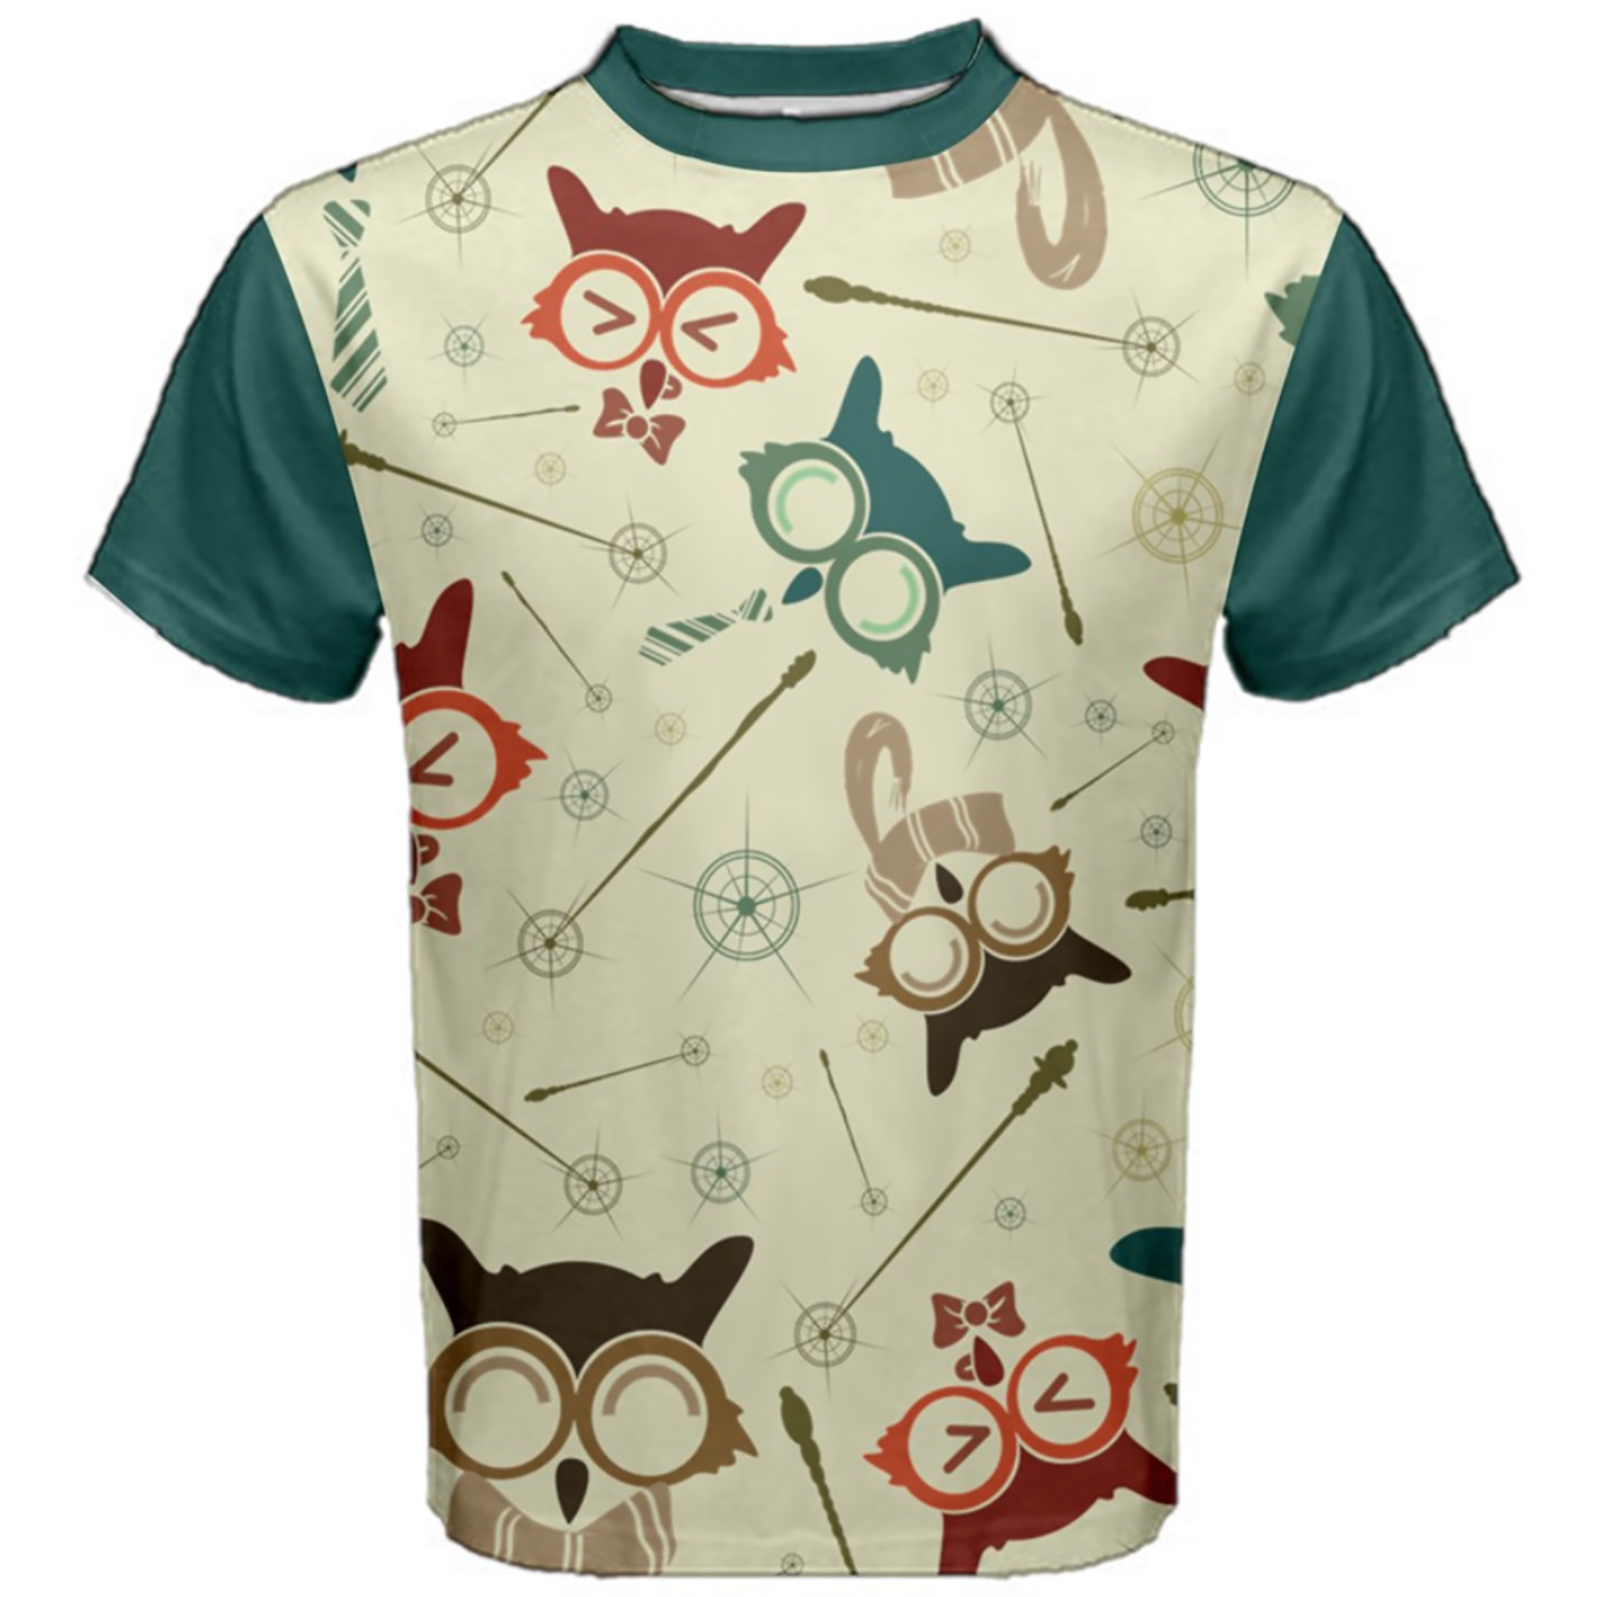 Vintage Emoji Owl Cotton Tee (Patterned- Blue Sleeves)